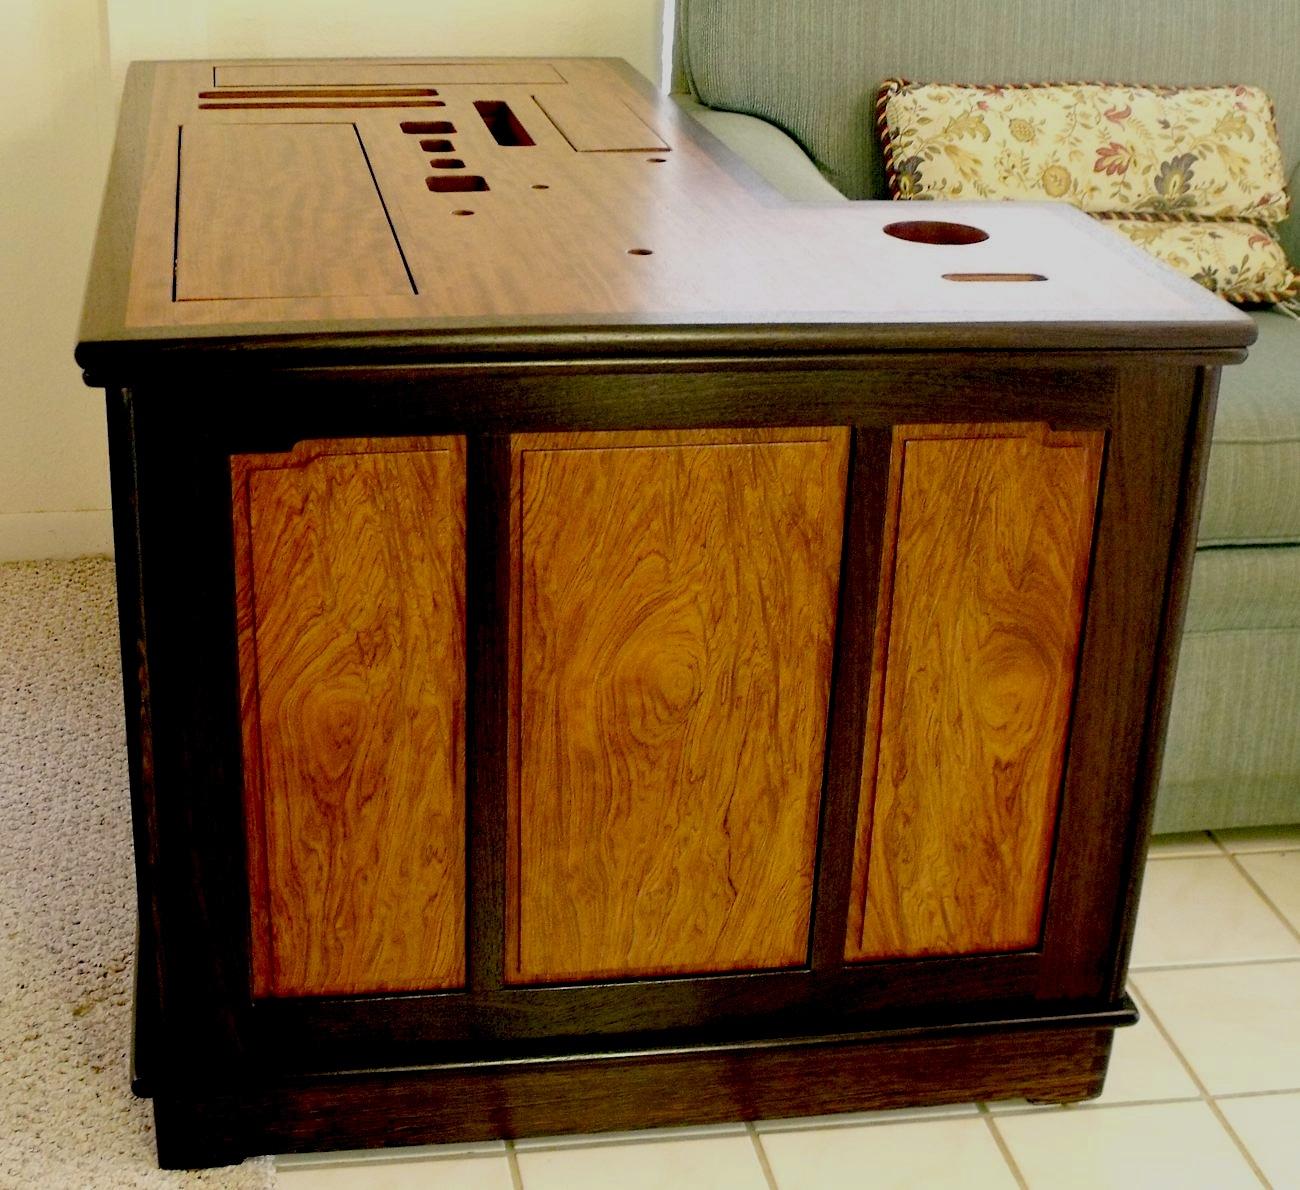 Computer desk design within reach for Design within reach desk